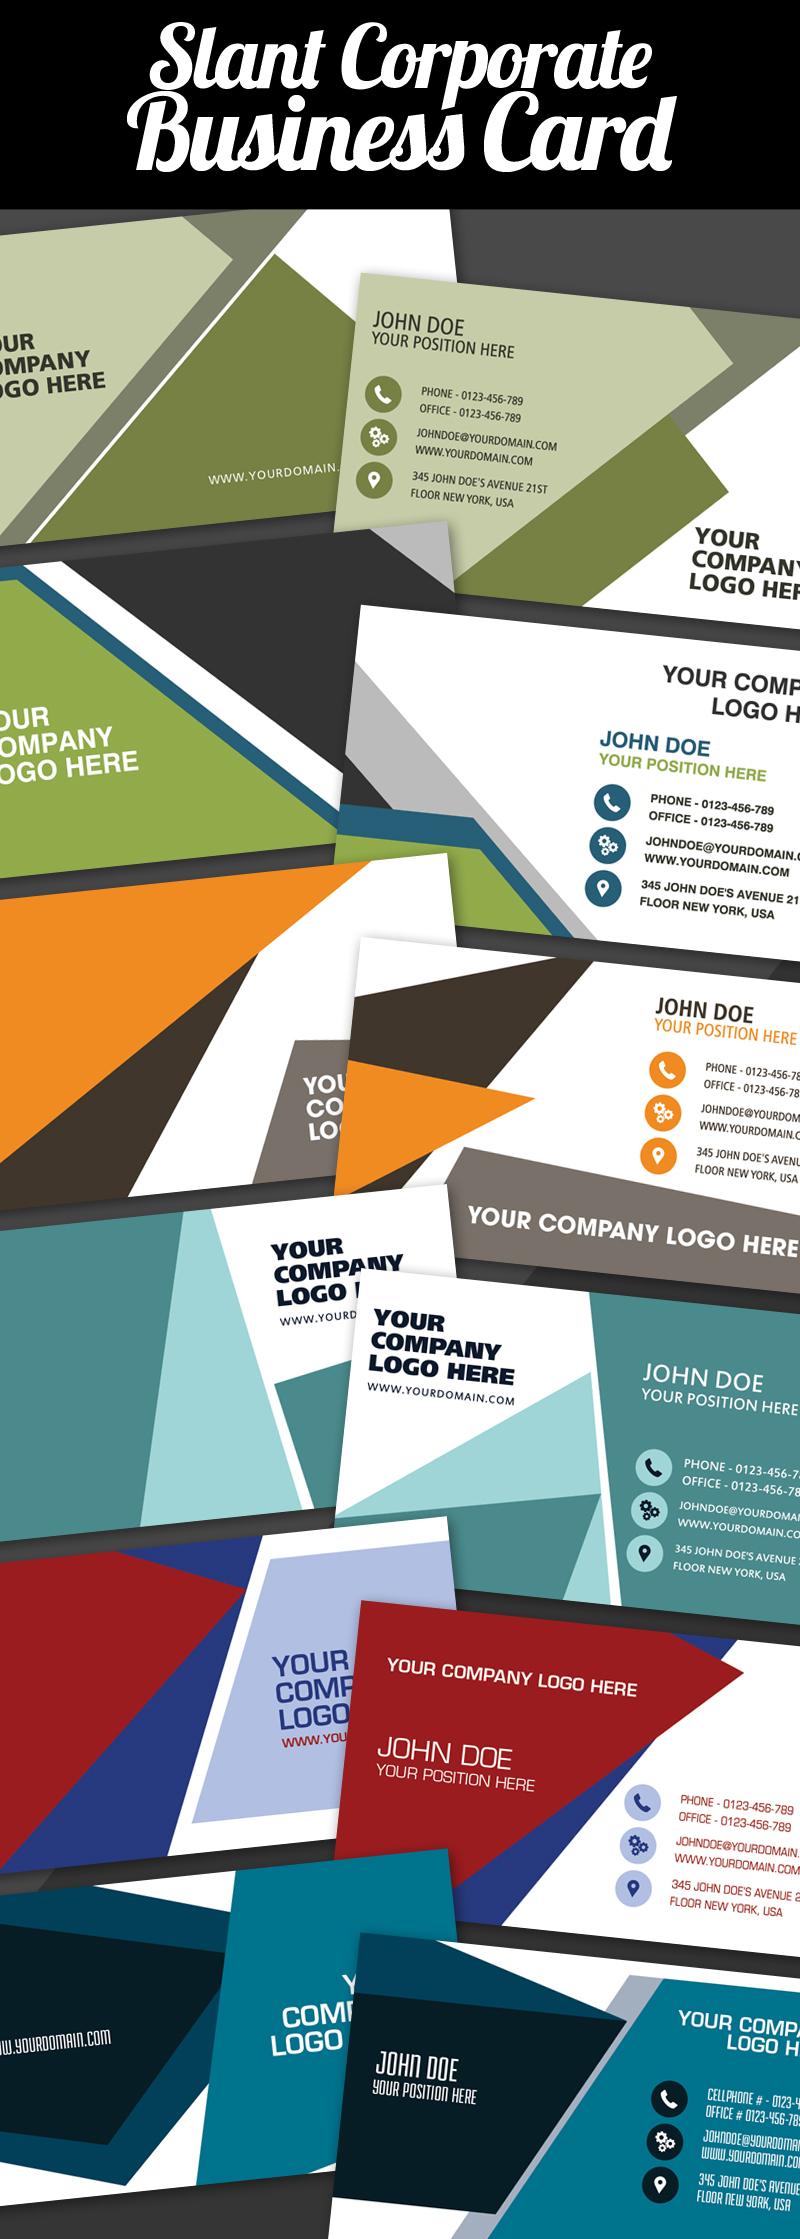 Slant Corporate Business Card